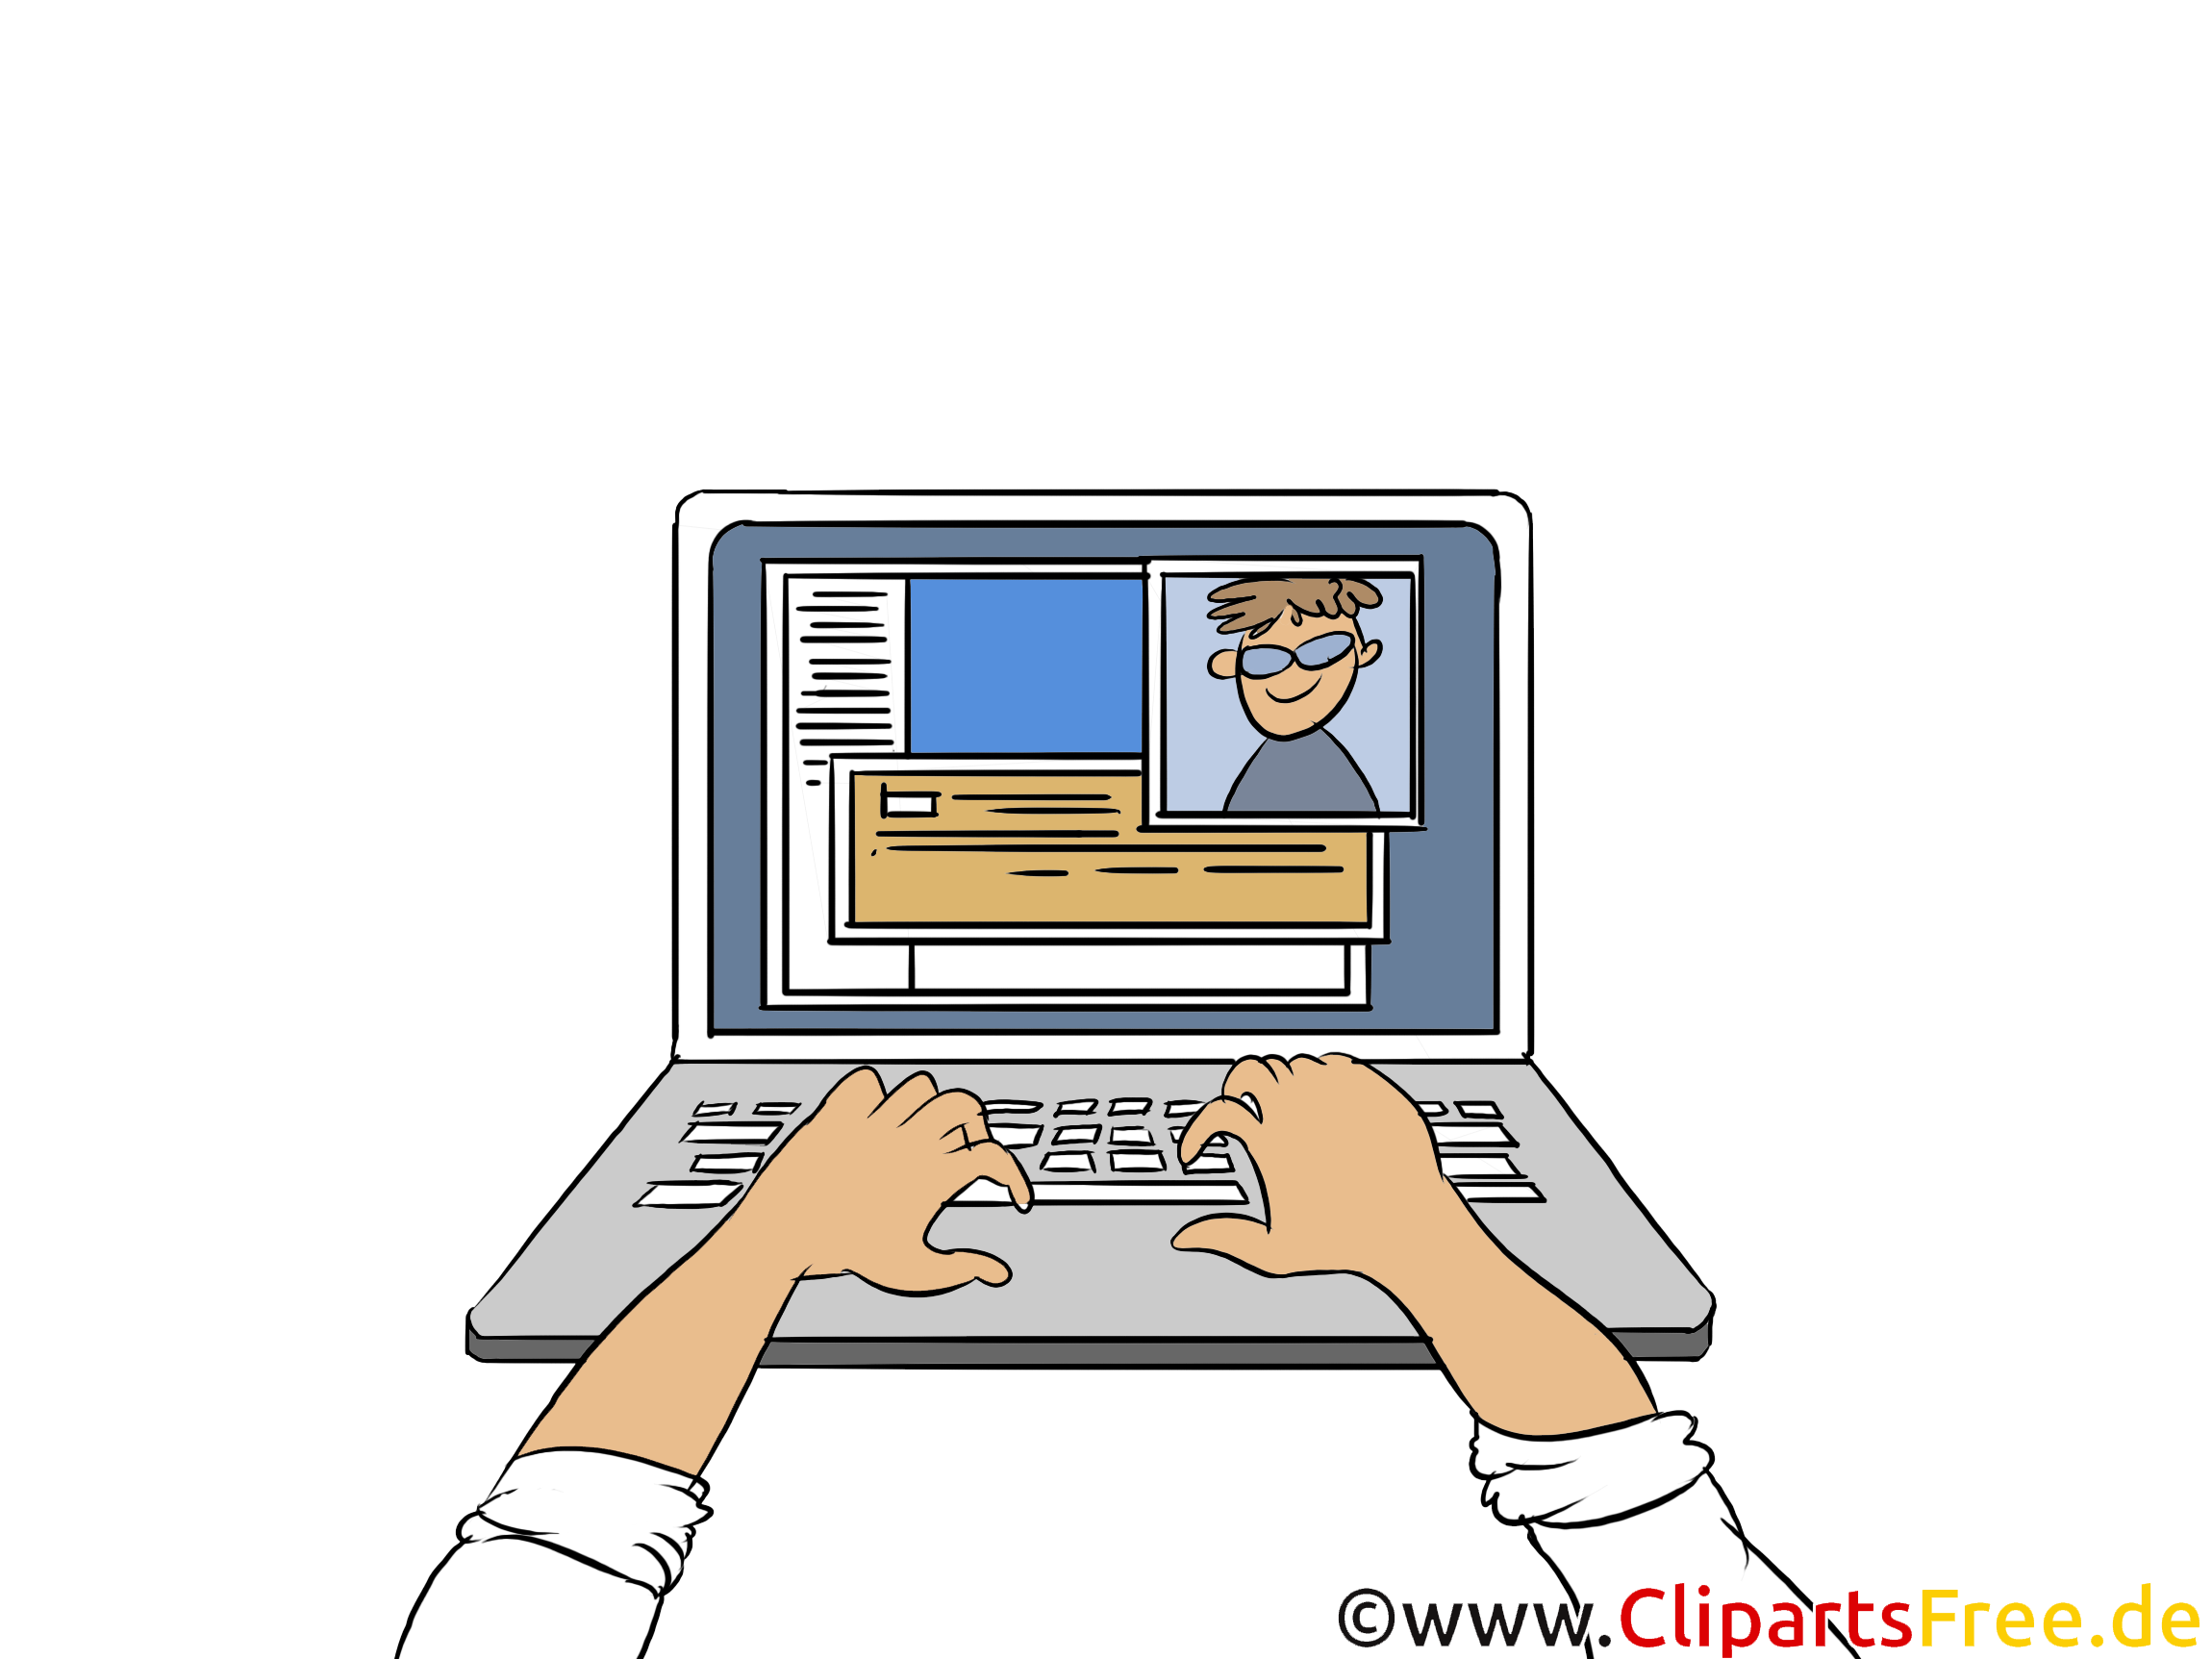 Hände tippen Text an Tastatur Clipart, Bild, Illustration